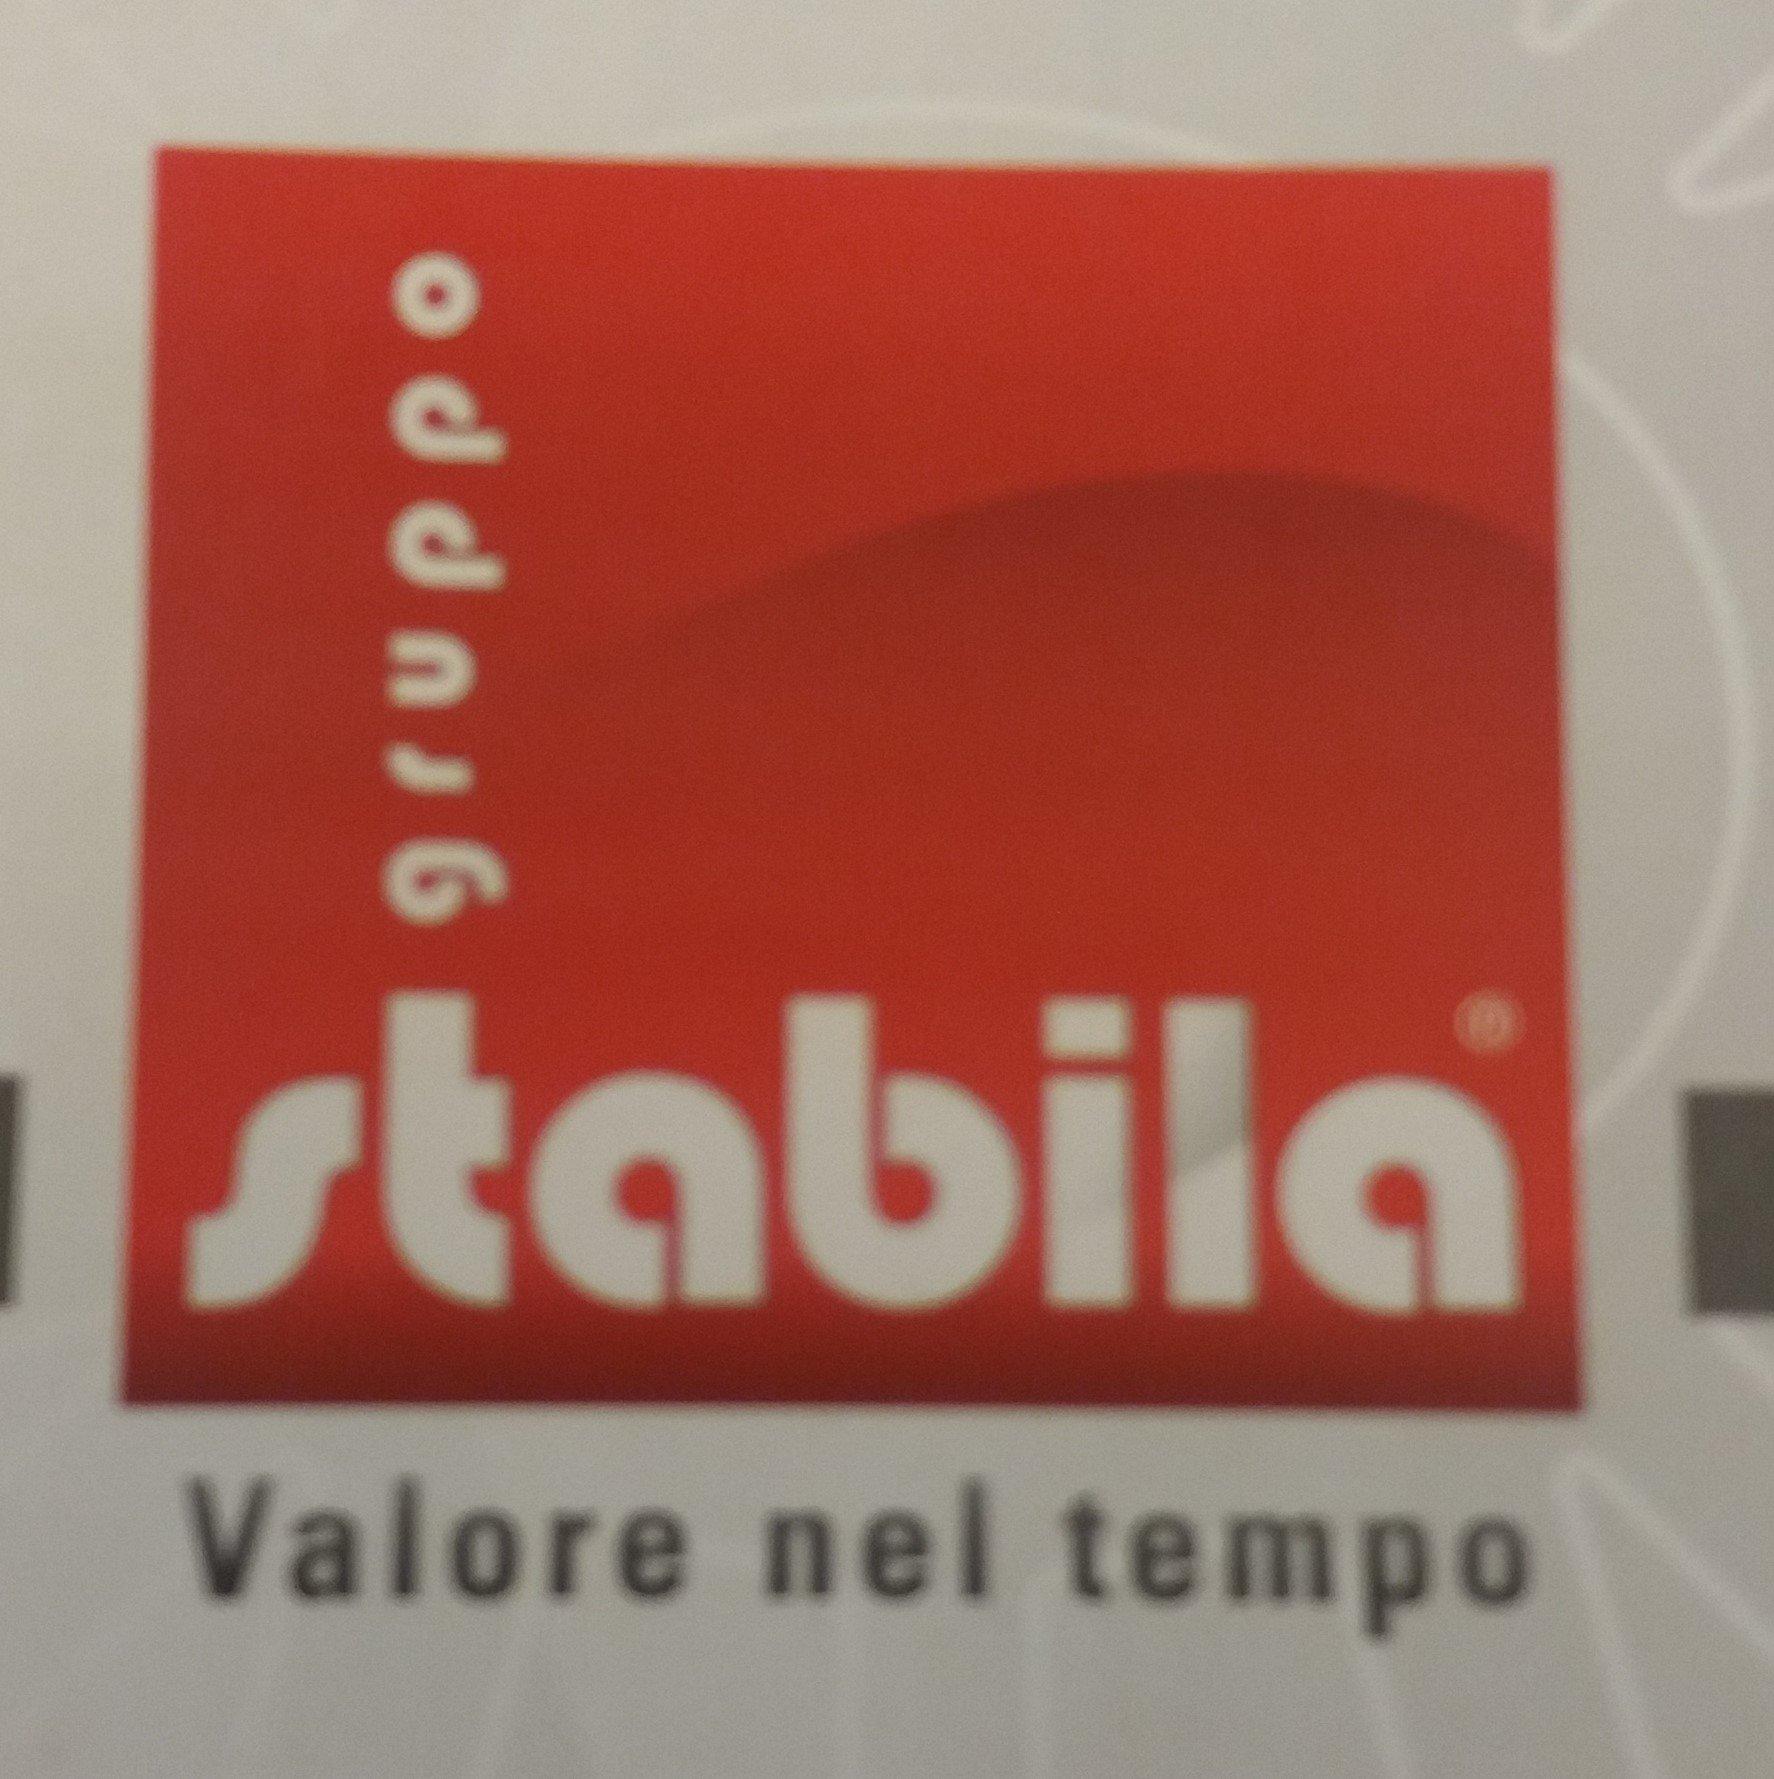 Gruppo Stabila logo